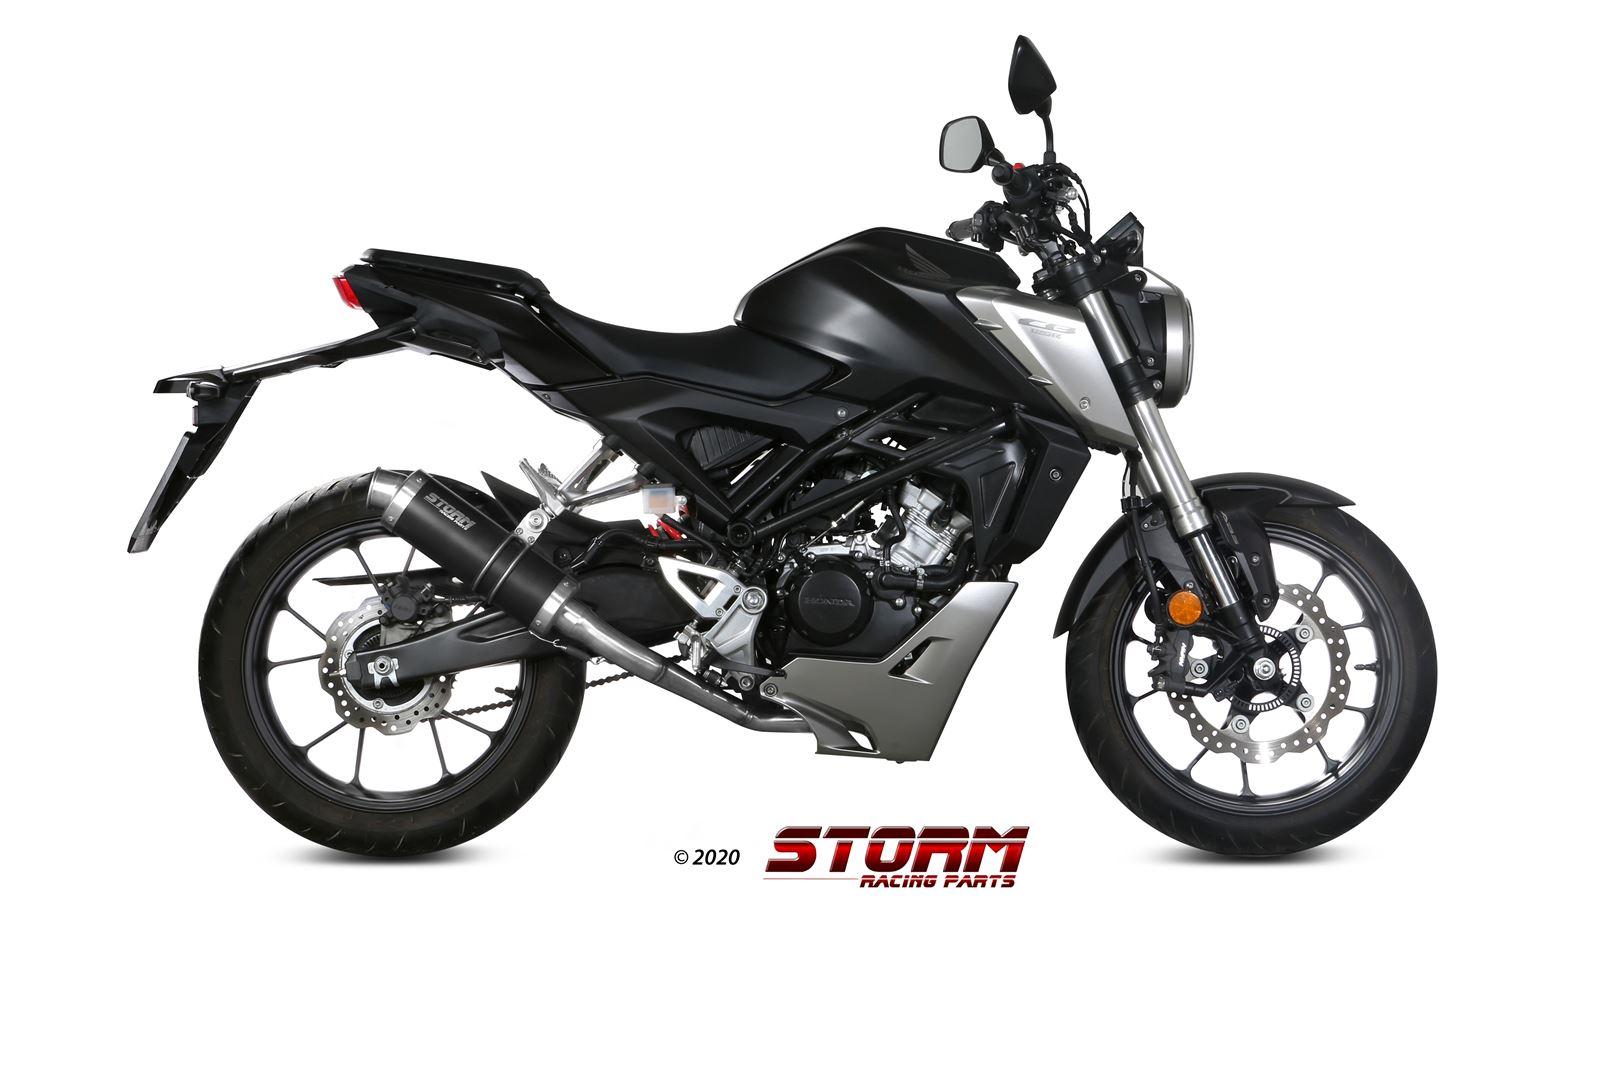 Honda_CB125R_2019-_74H074LXSB_$01